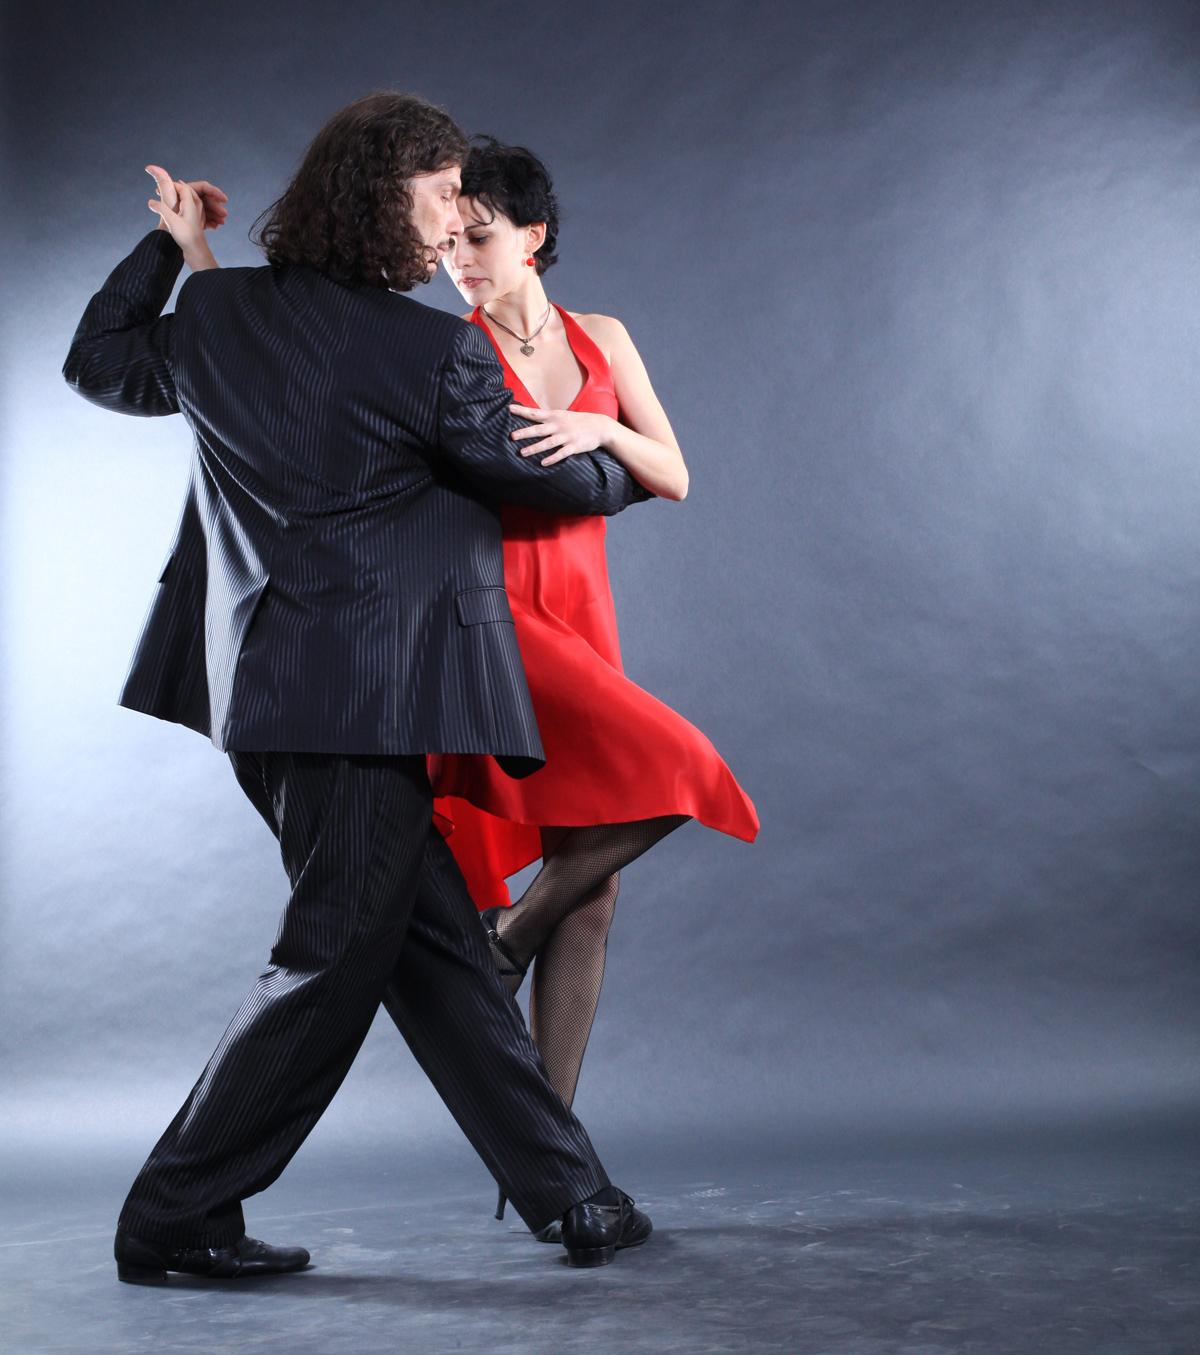 Мужчина и женщина в танго